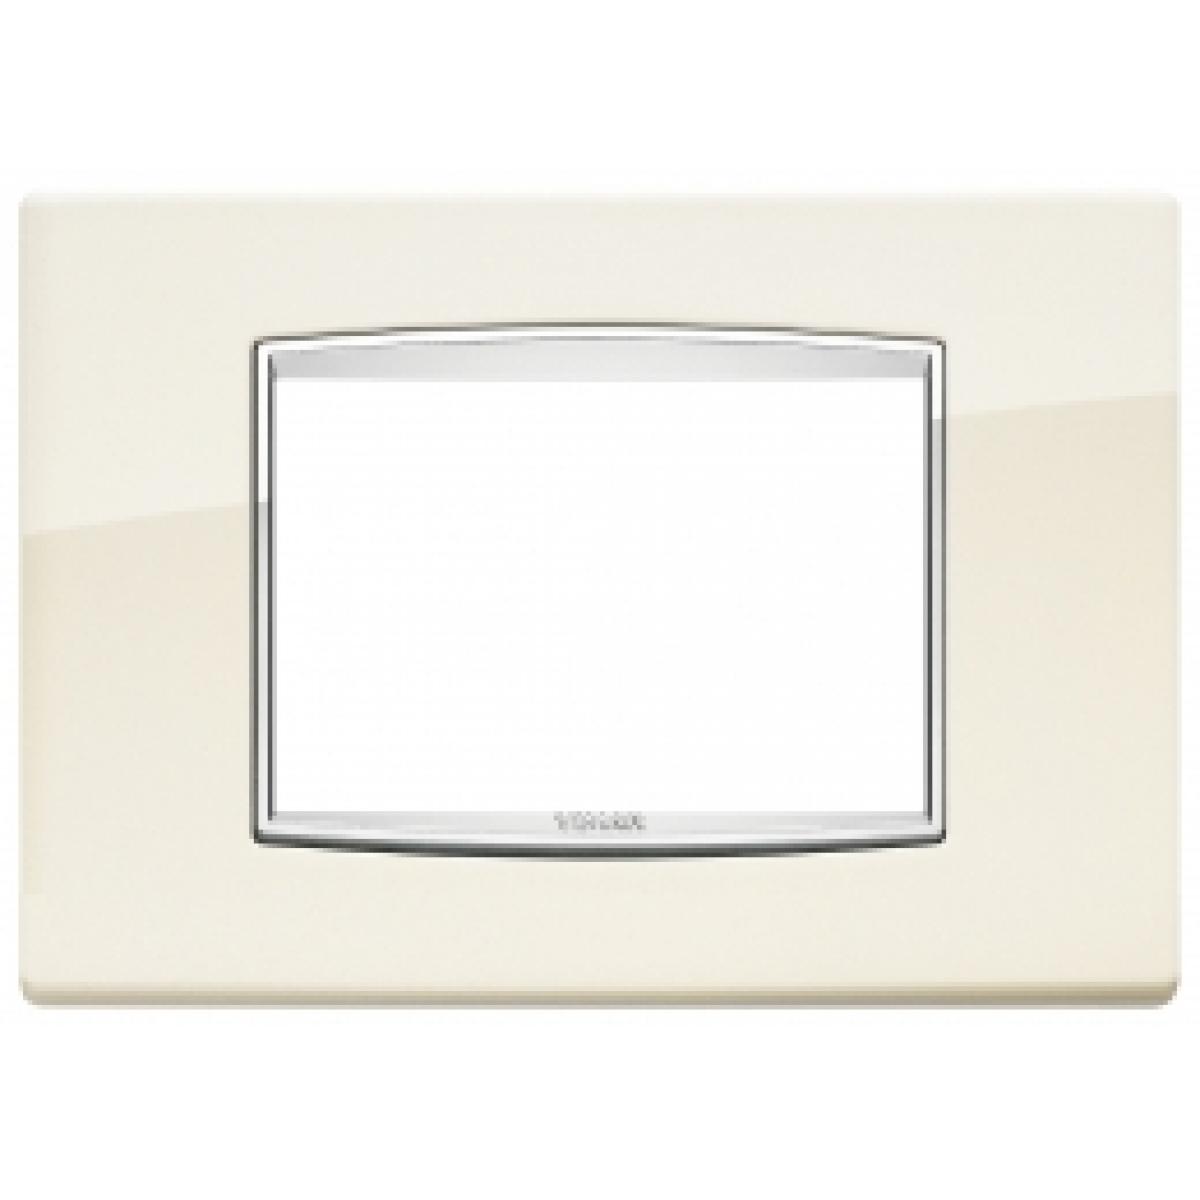 Eikon vimar placca classic 3 posti colore bianco antico 20653.02